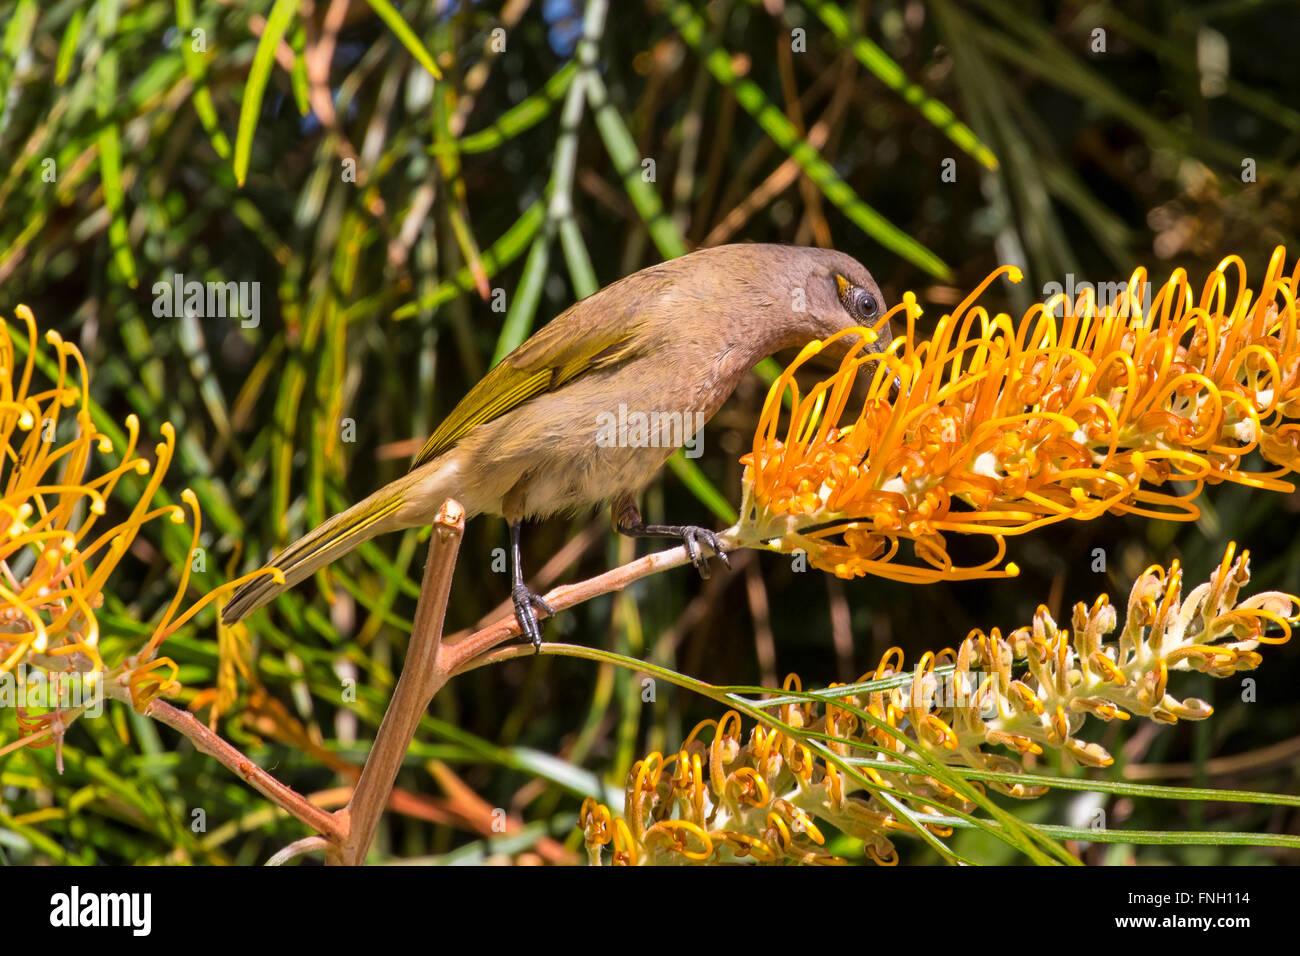 Brown, honeyeater feeding on nectar brisbane, queensland, australia - Stock Image